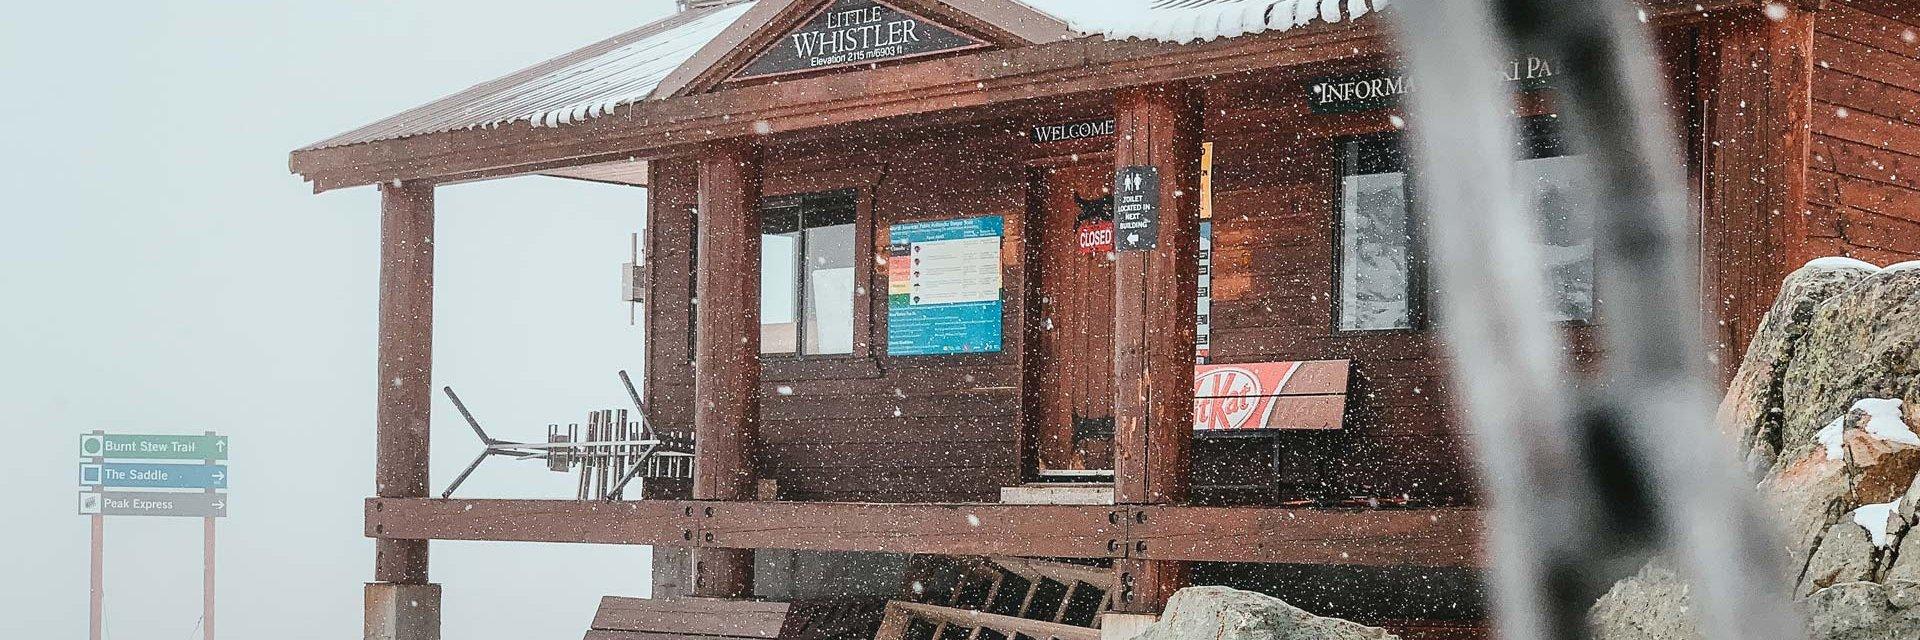 Explorez Whistler en hiver